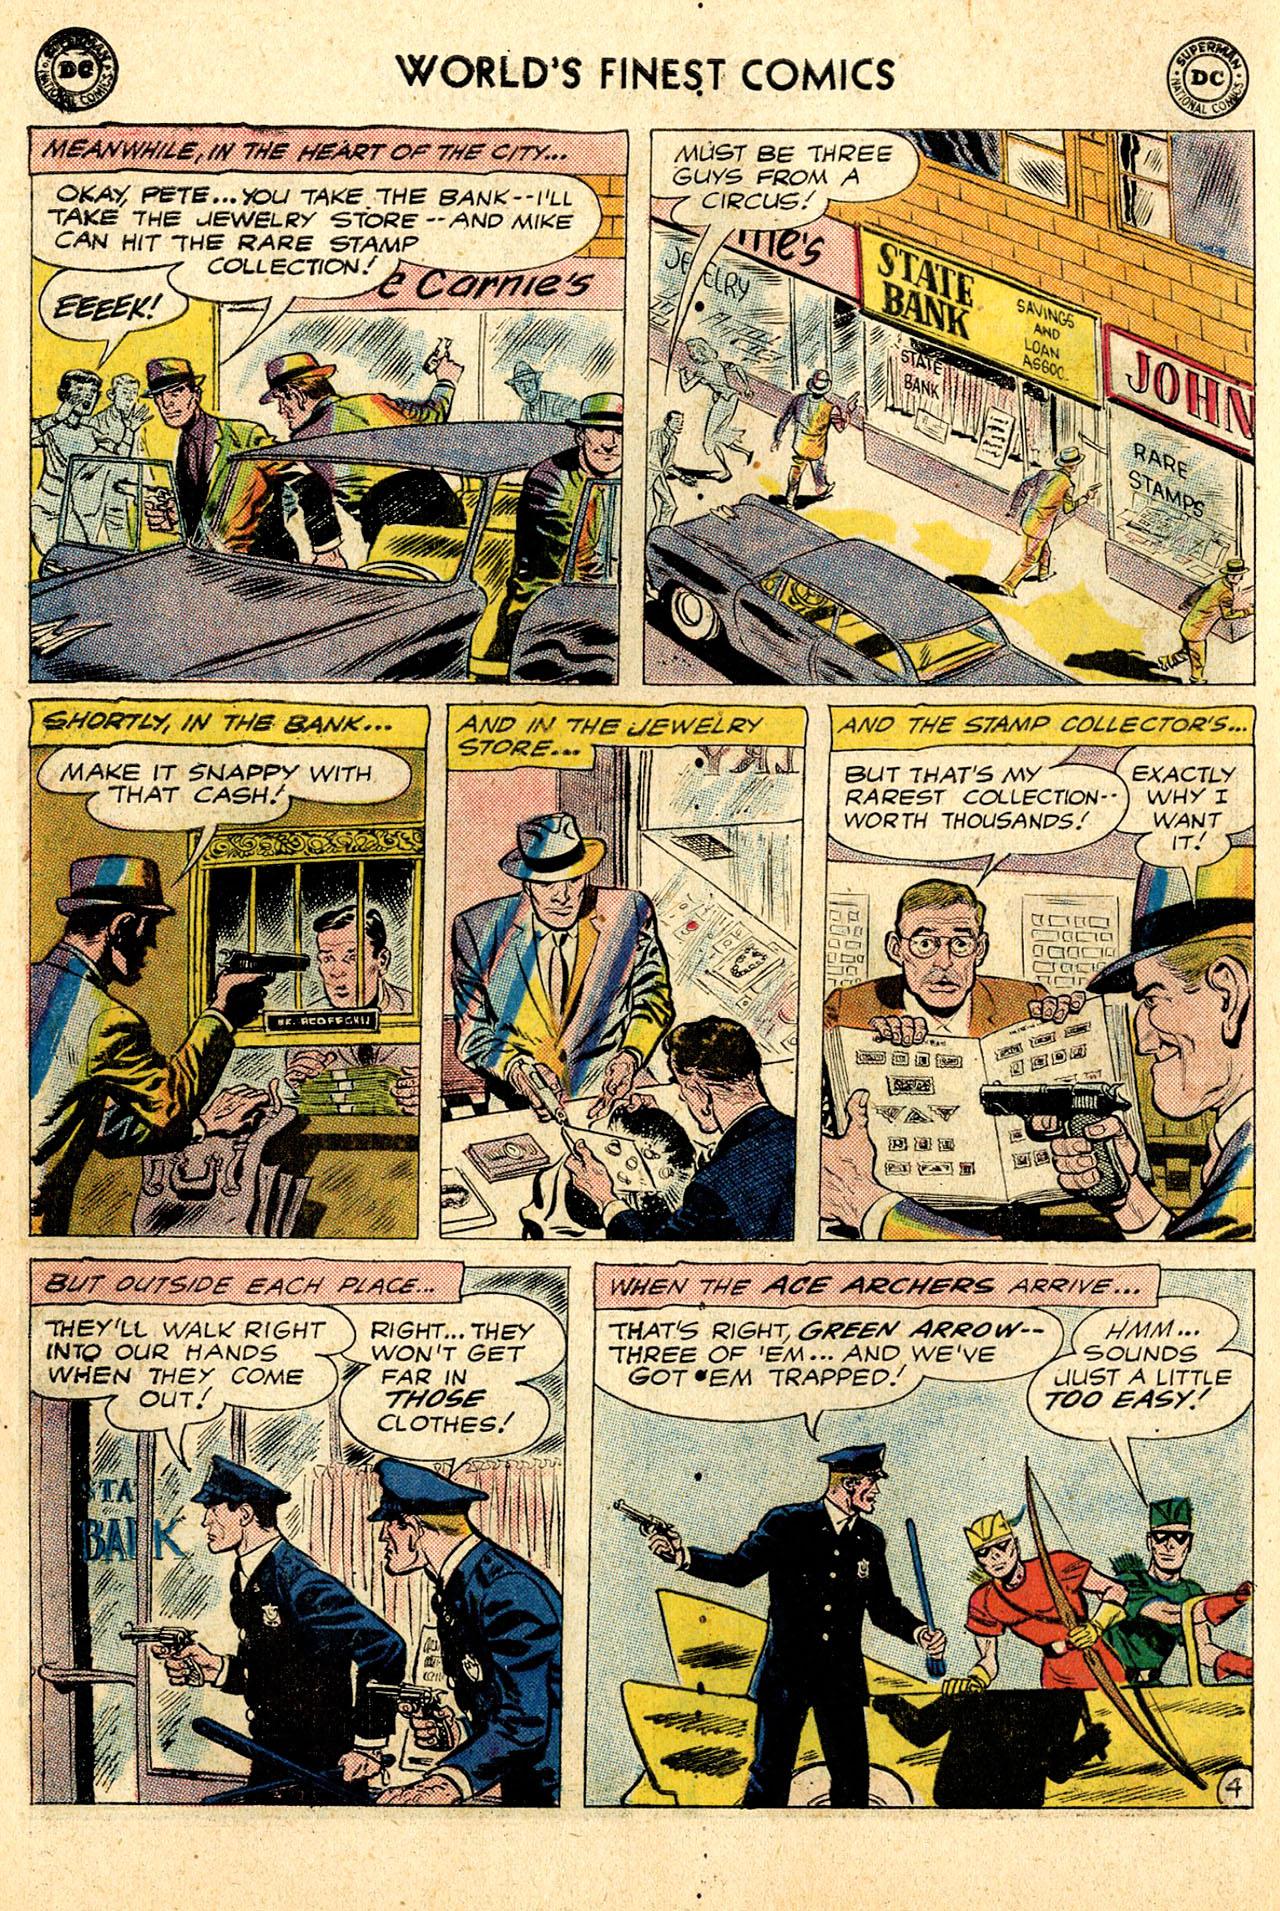 Read online World's Finest Comics comic -  Issue #110 - 30